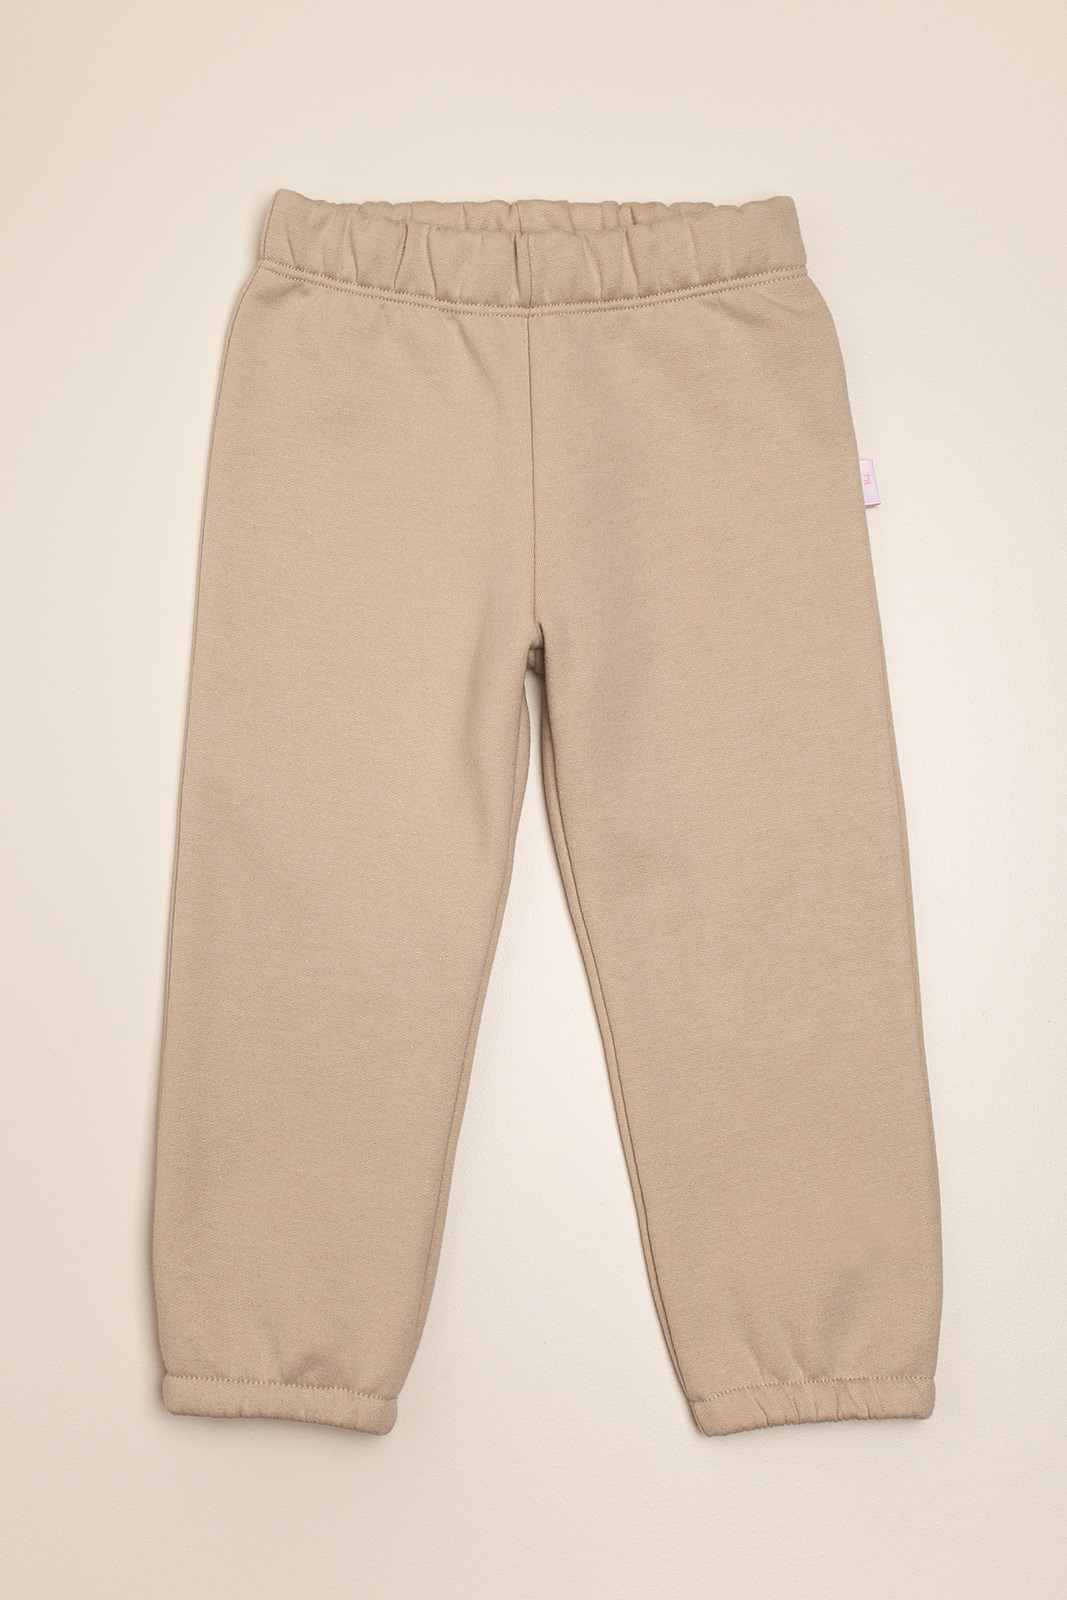 Pantalon de frisa beige Lucia